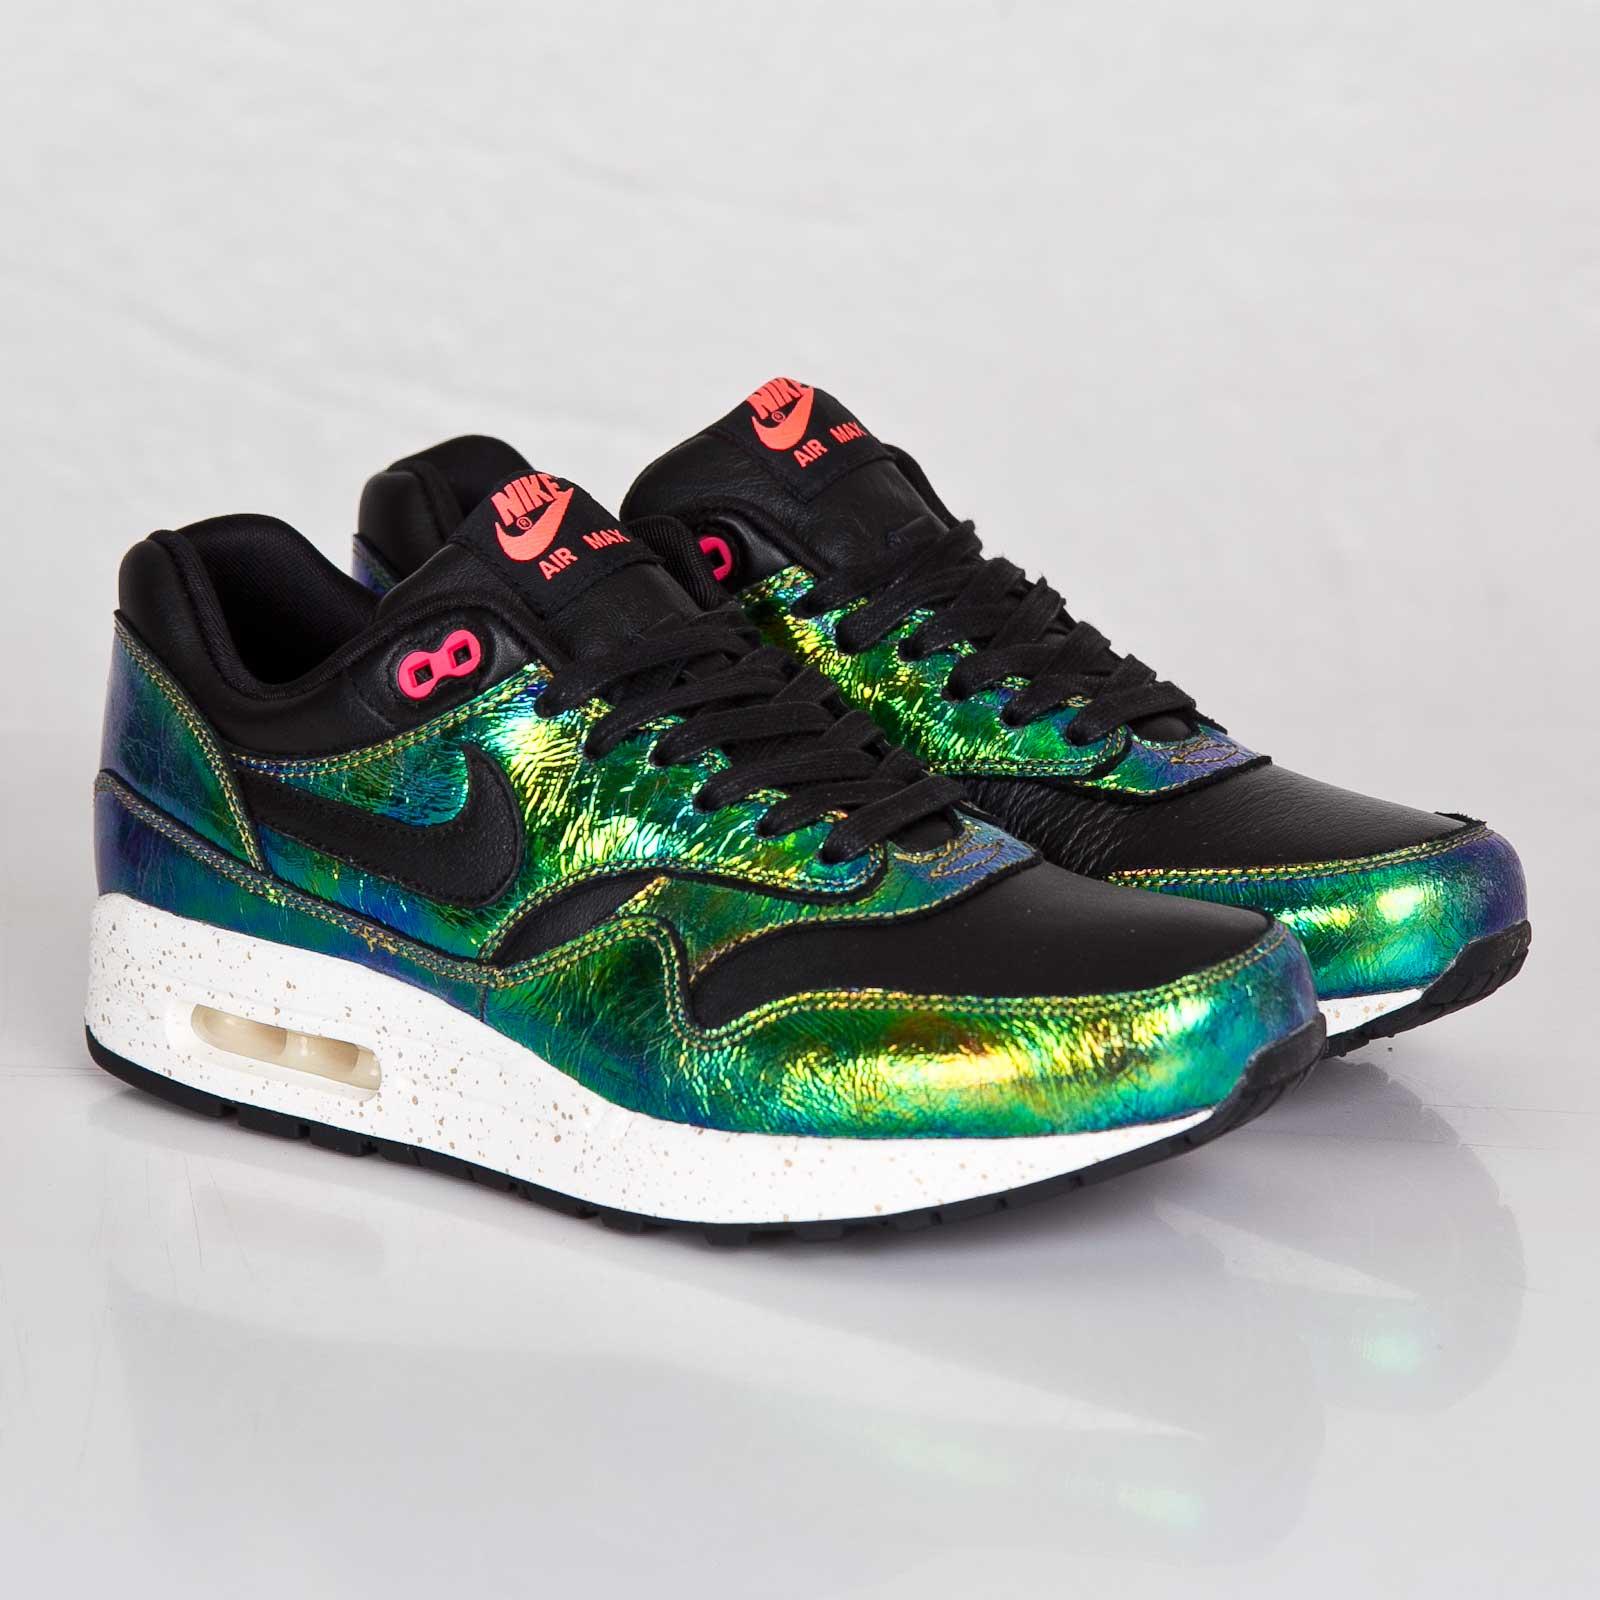 Nike Air Max 1 Sup QS 669639 700 Sneakersnstuff